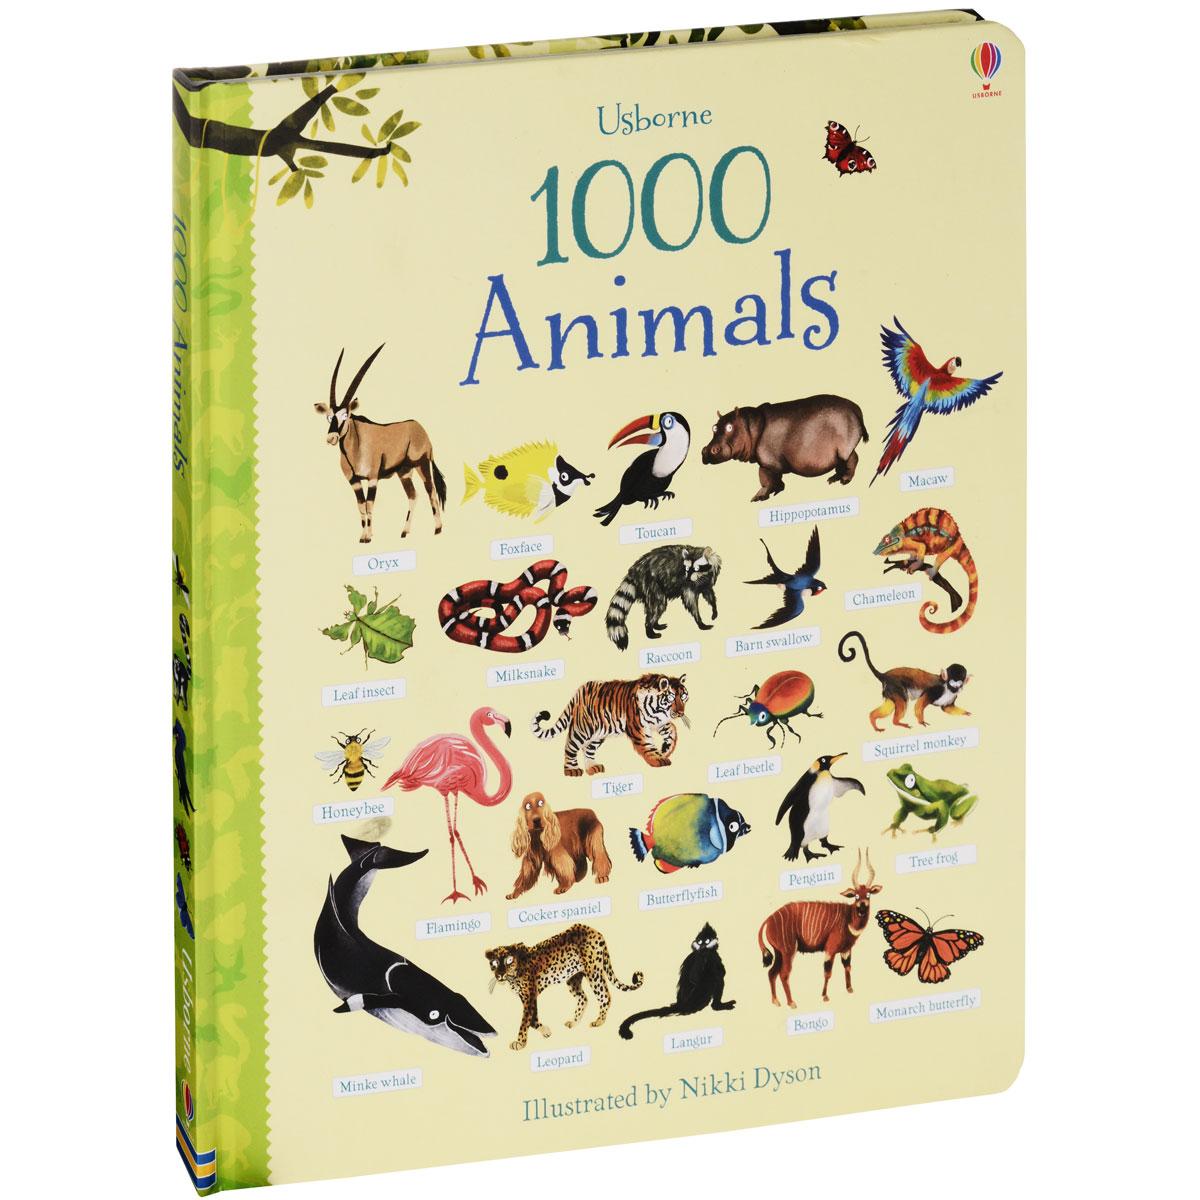 1000 Animals thousand words